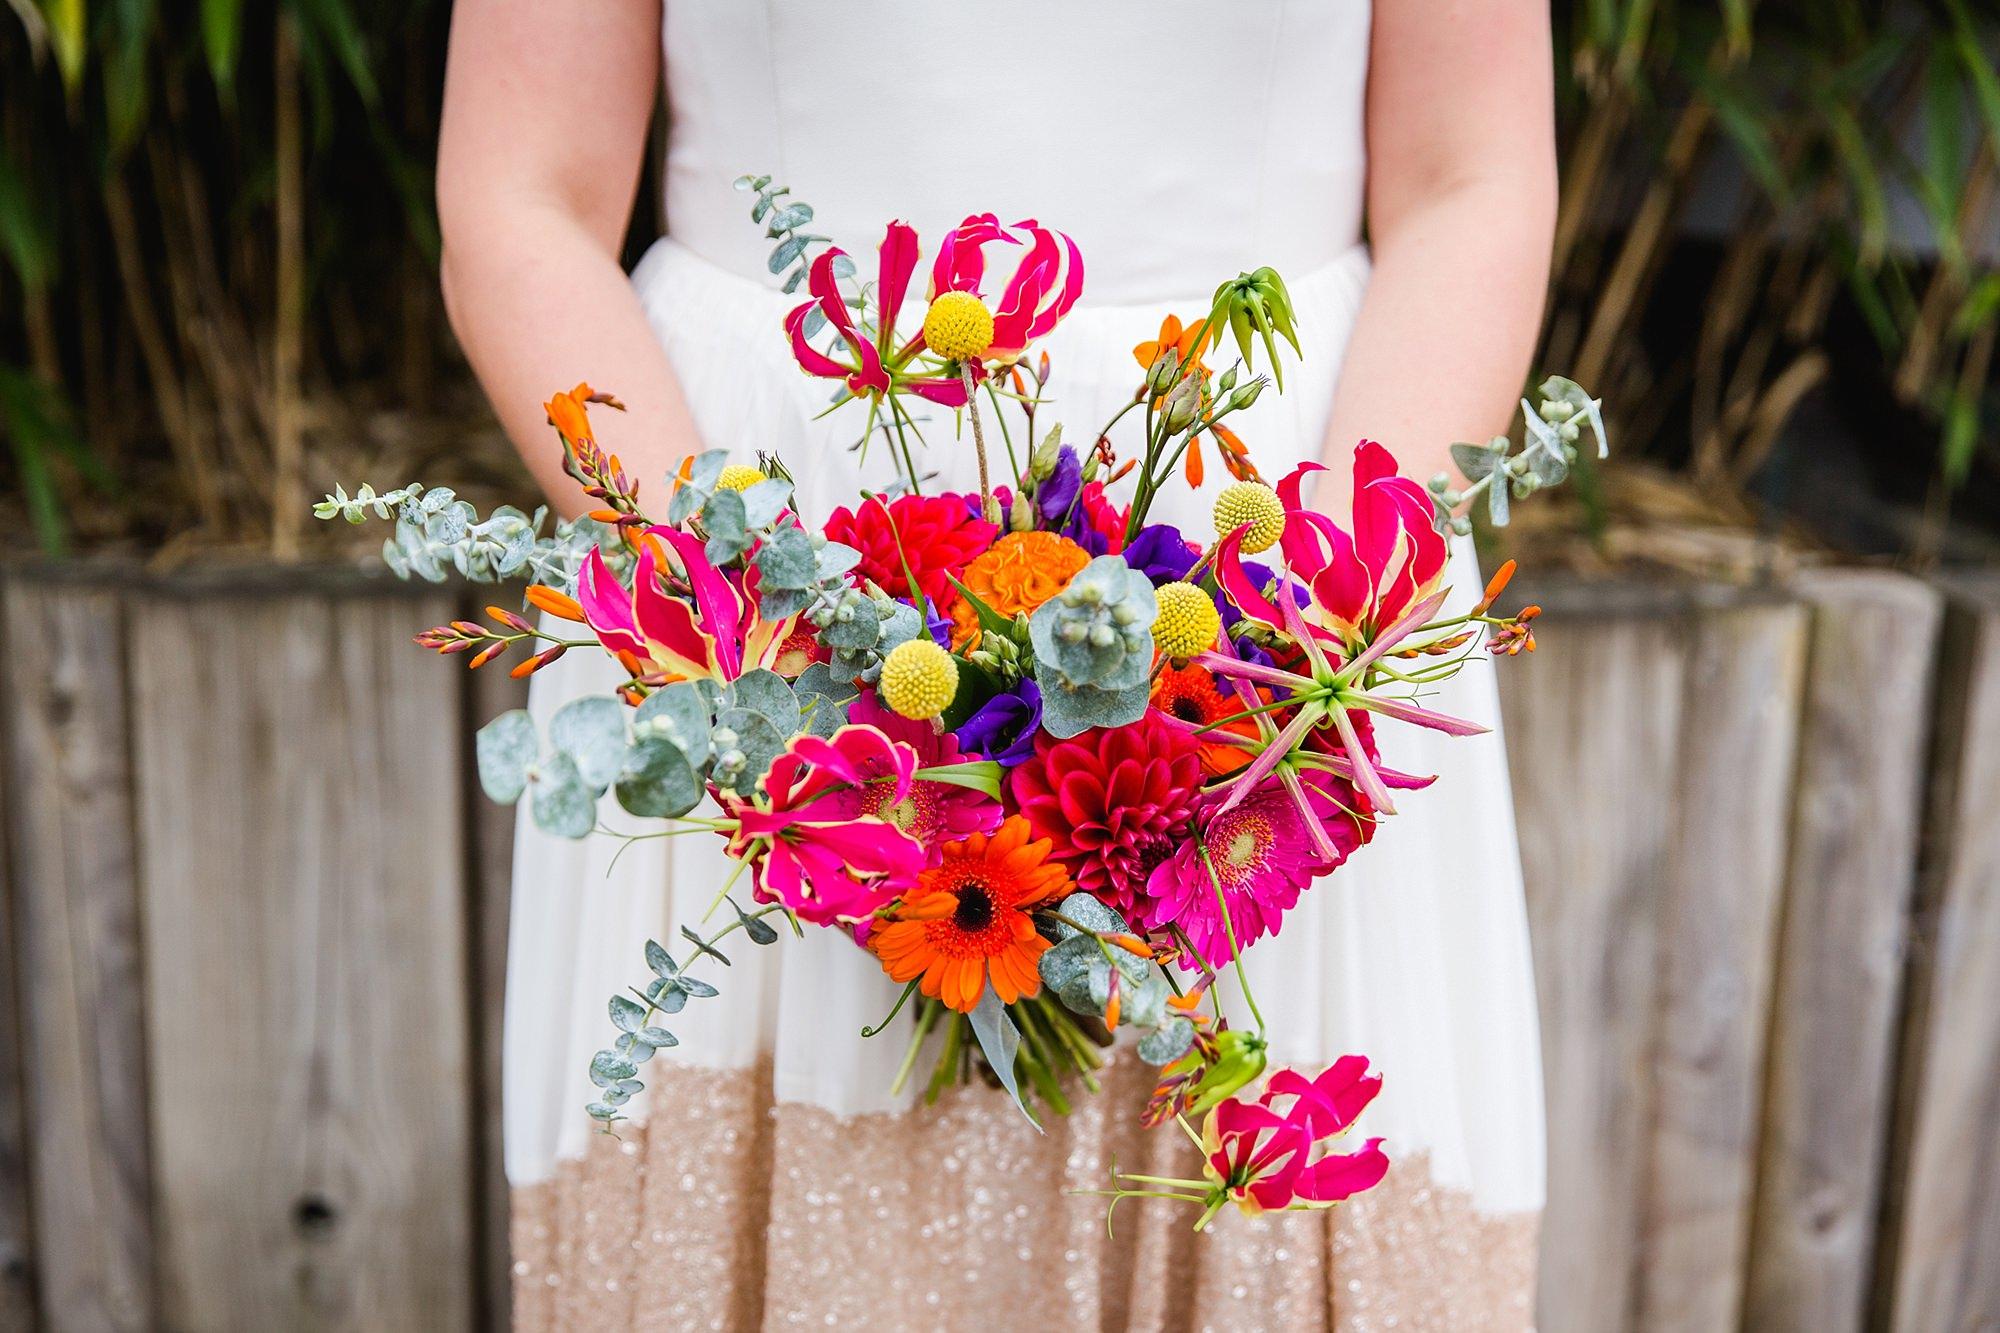 Fun London Wedding bright and colourful bride's bouquet